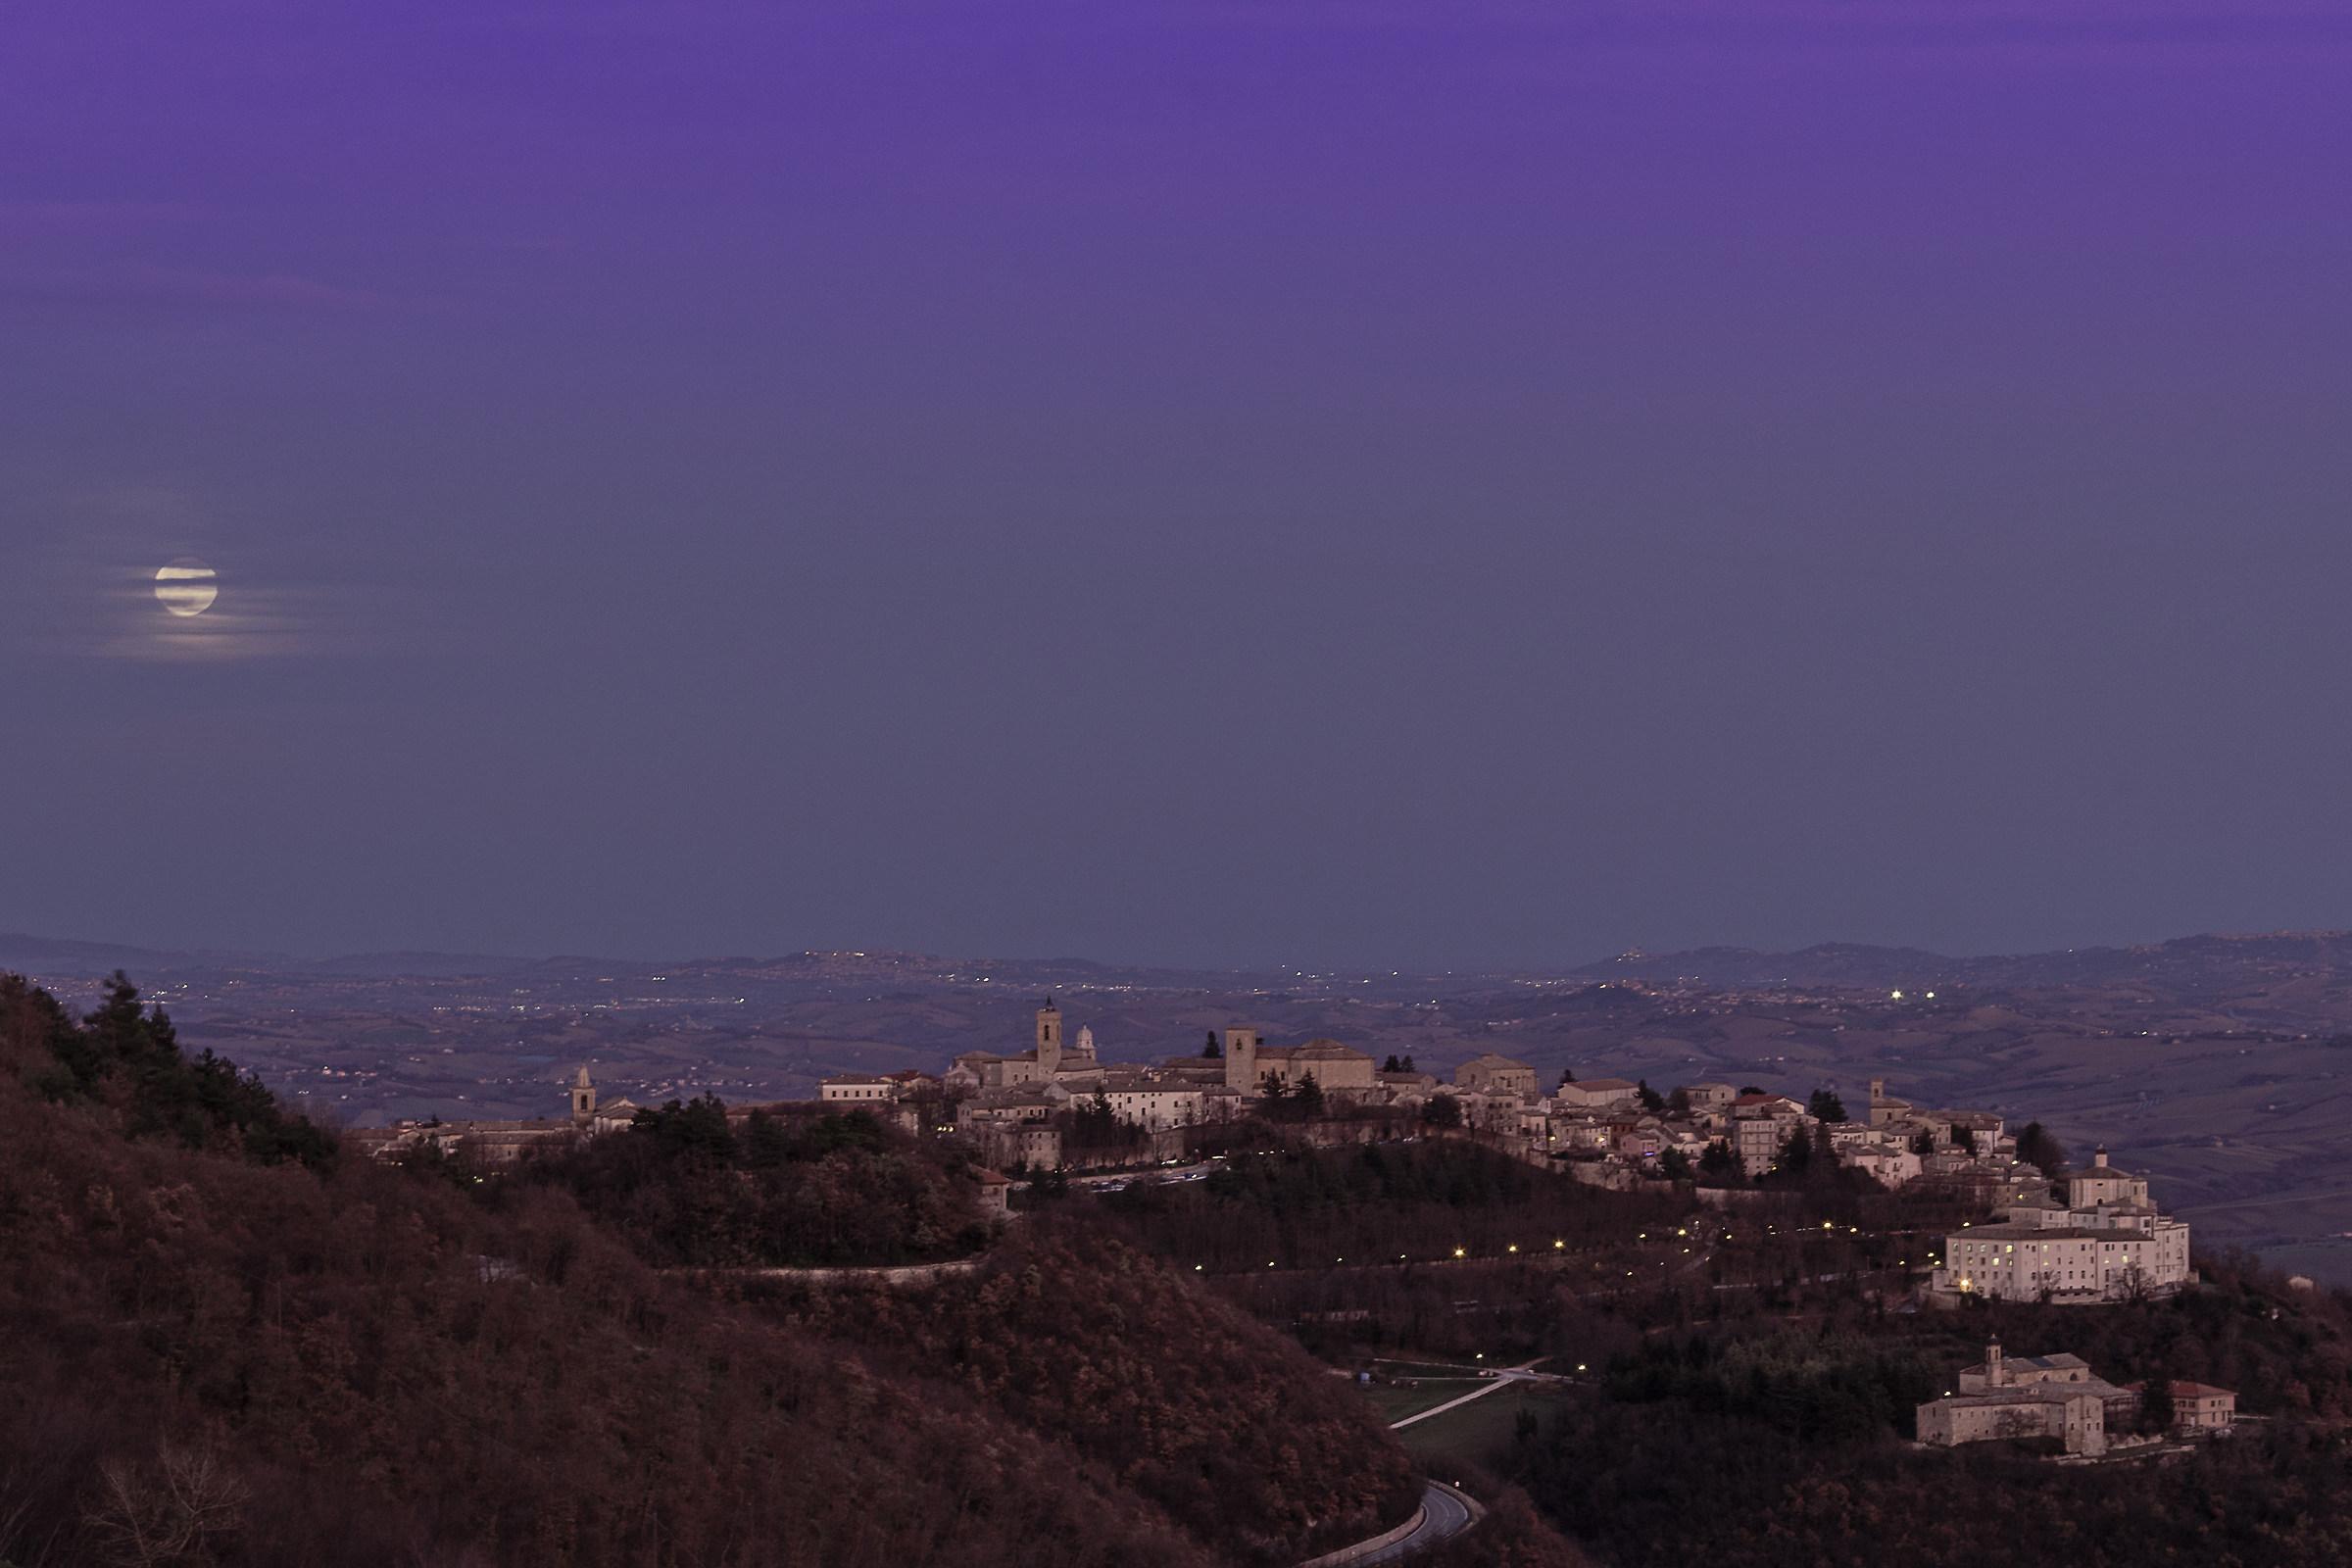 In the Moonlight-Cingoli...